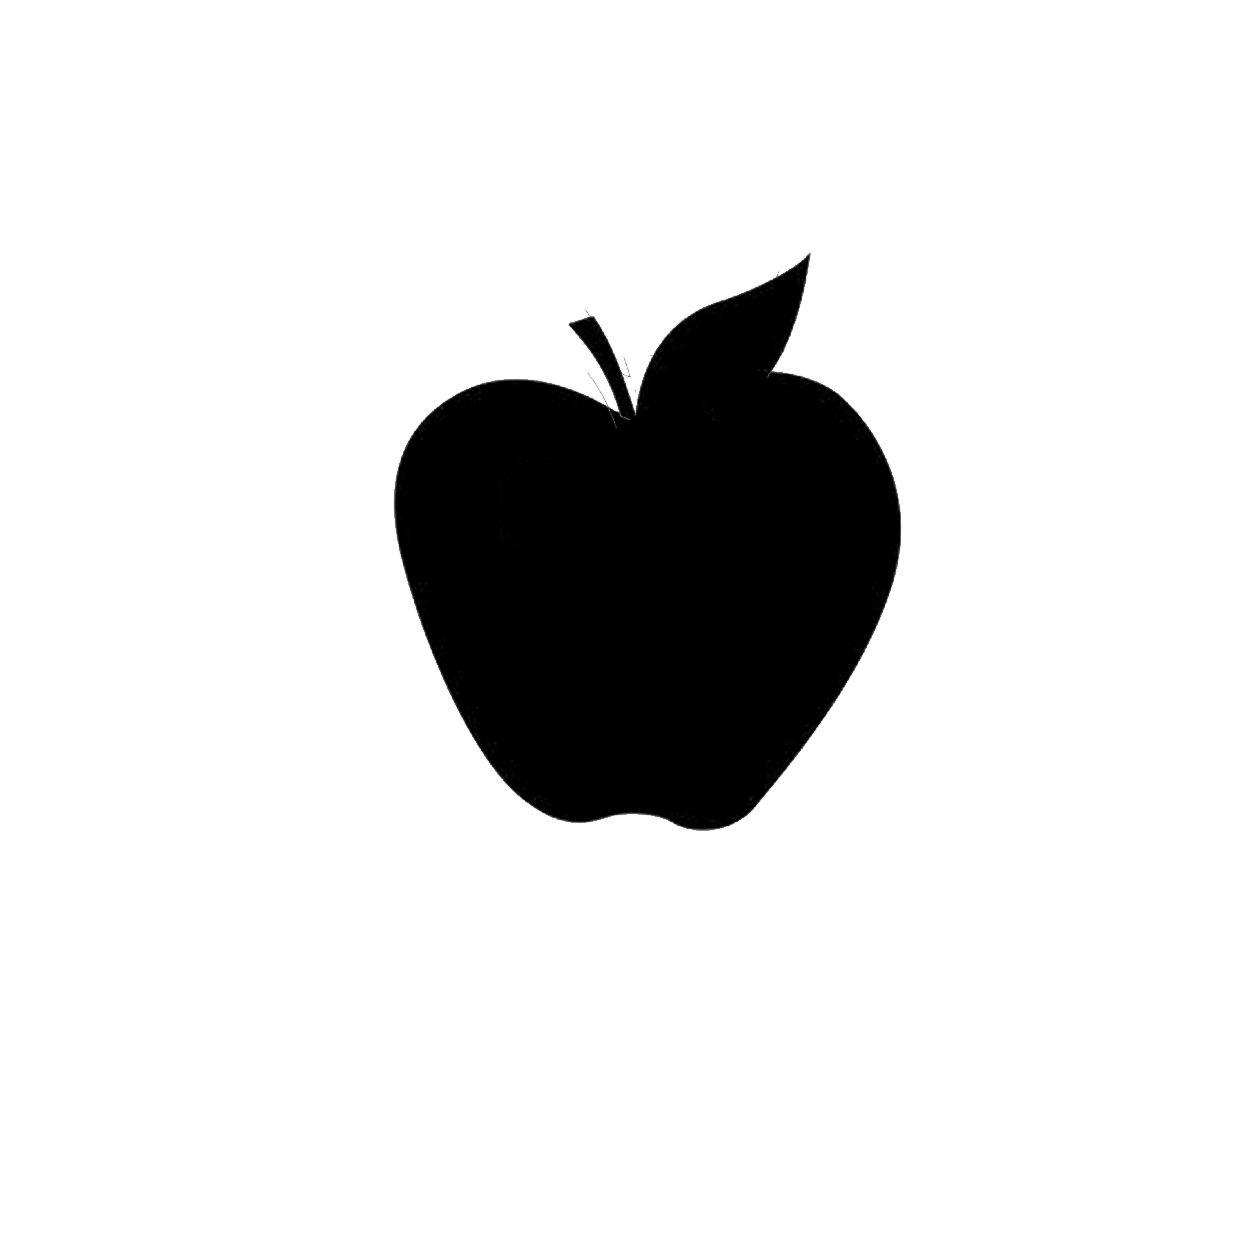 Download free svg files | Free SVG File Download - Apple | Svg free ...